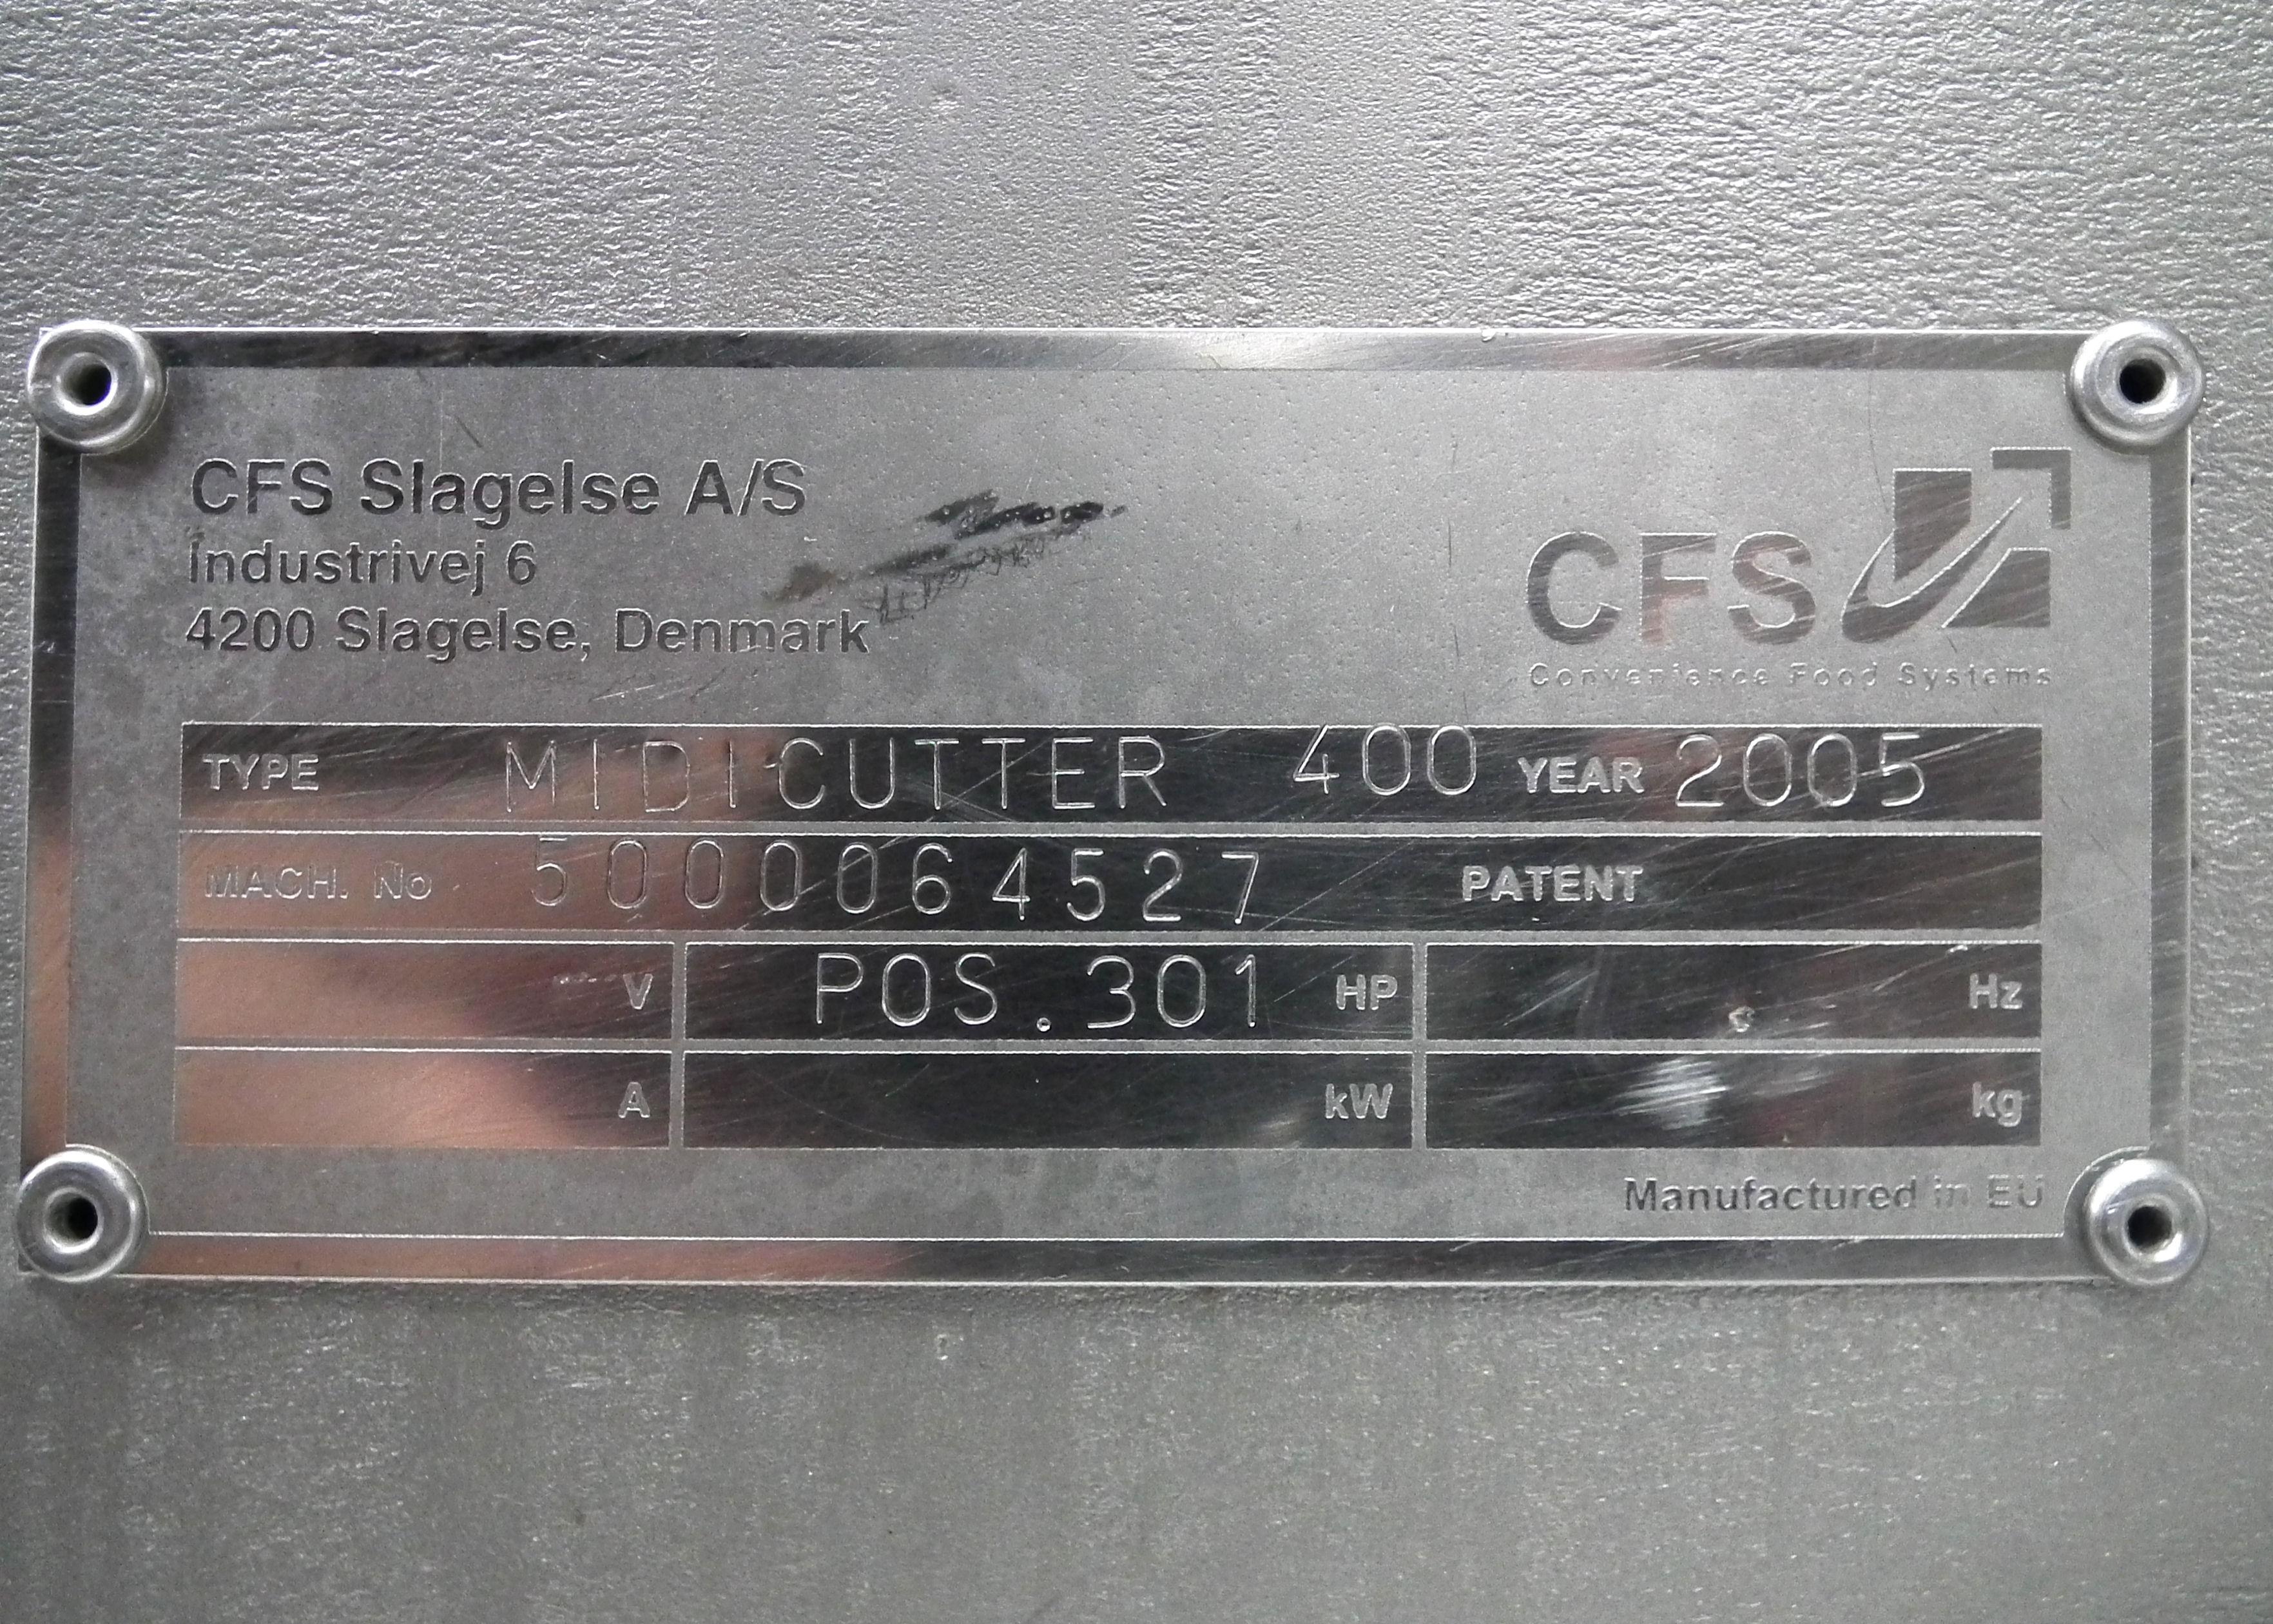 CFS Midicutter 400 Grinder B3665 - Image 11 of 11